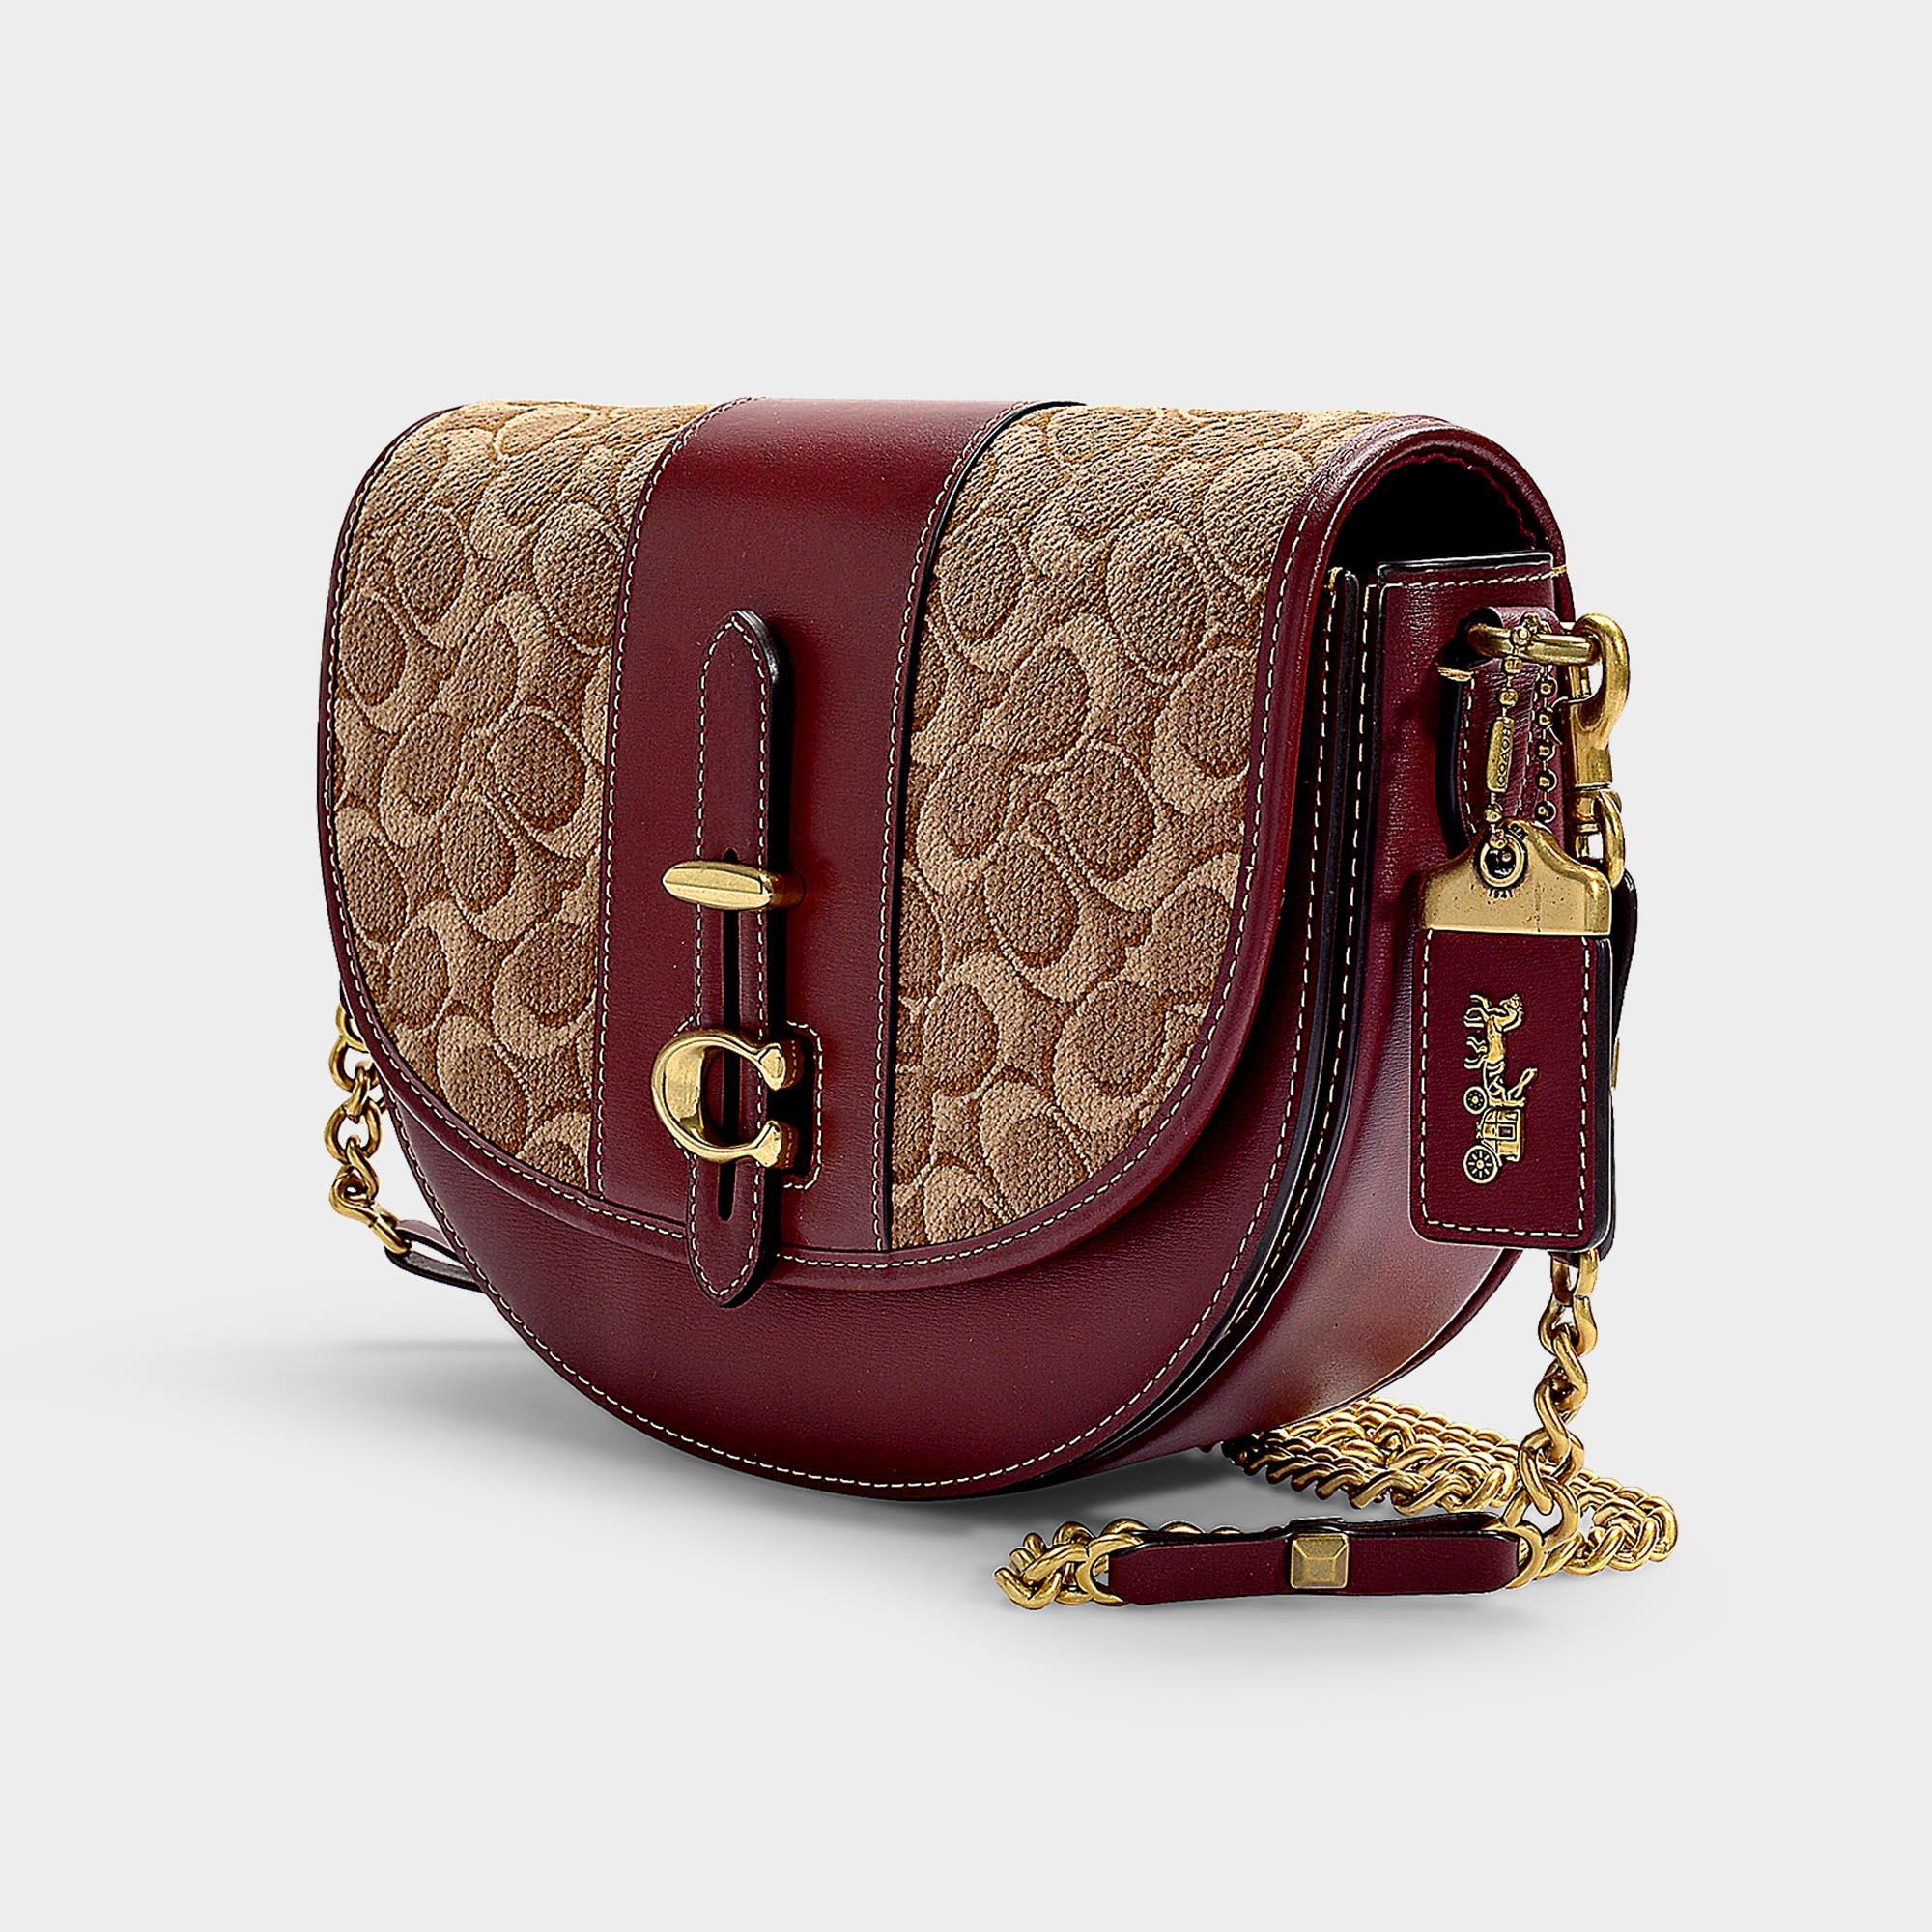 a9a3053a9 COACH Saddle Bag 24 In Tan Scarlet Signature Jacquard in Natural - Lyst